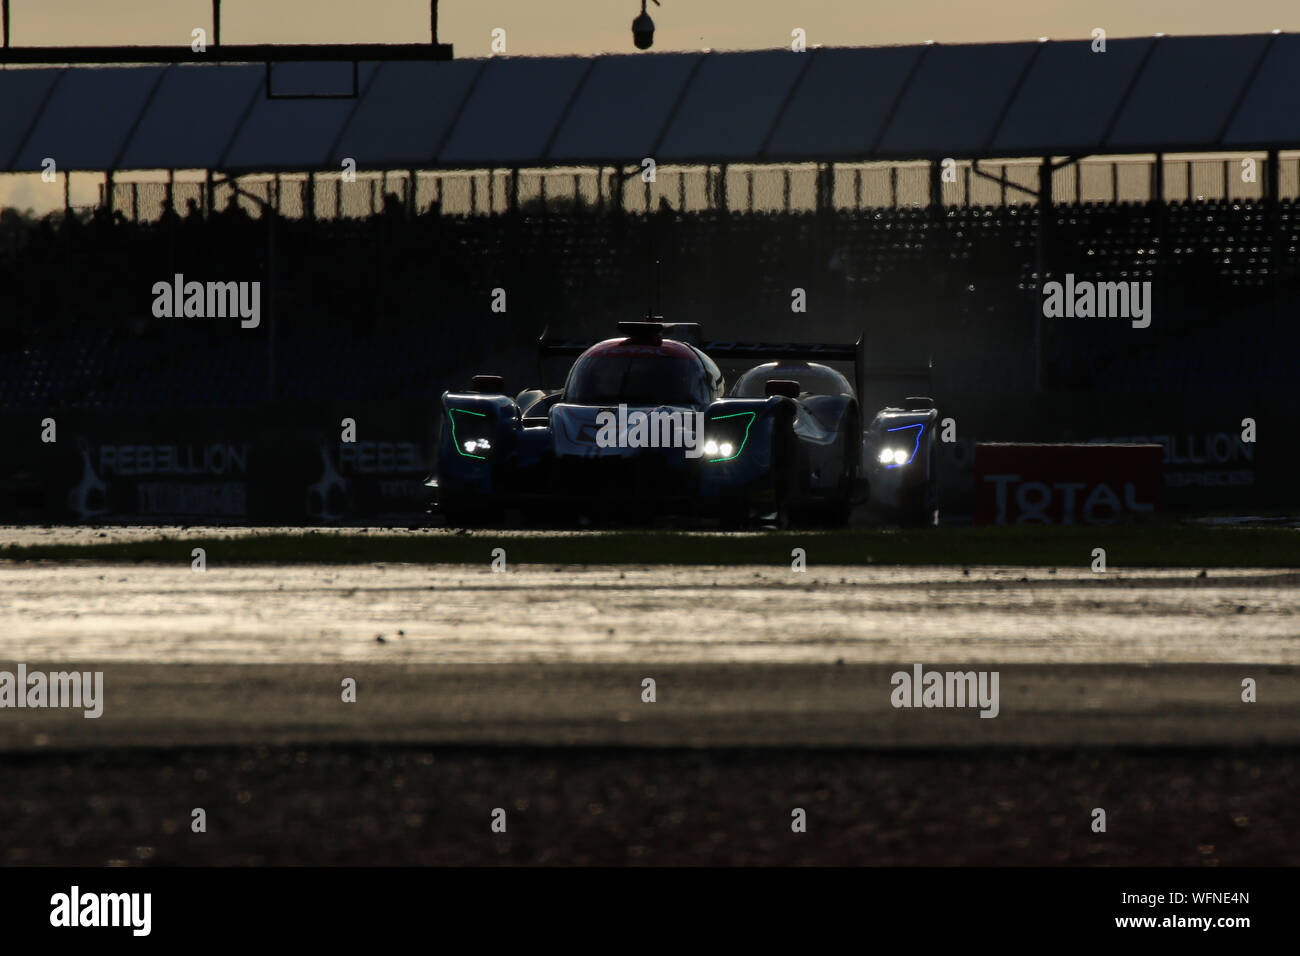 The #24 Panis Barthez Competition Ligier JSP217-Gibson of Timothe Buret, Konstantin Tereschenko and Leonard Hoogenboom during the European Le Mans Ser Stock Photo